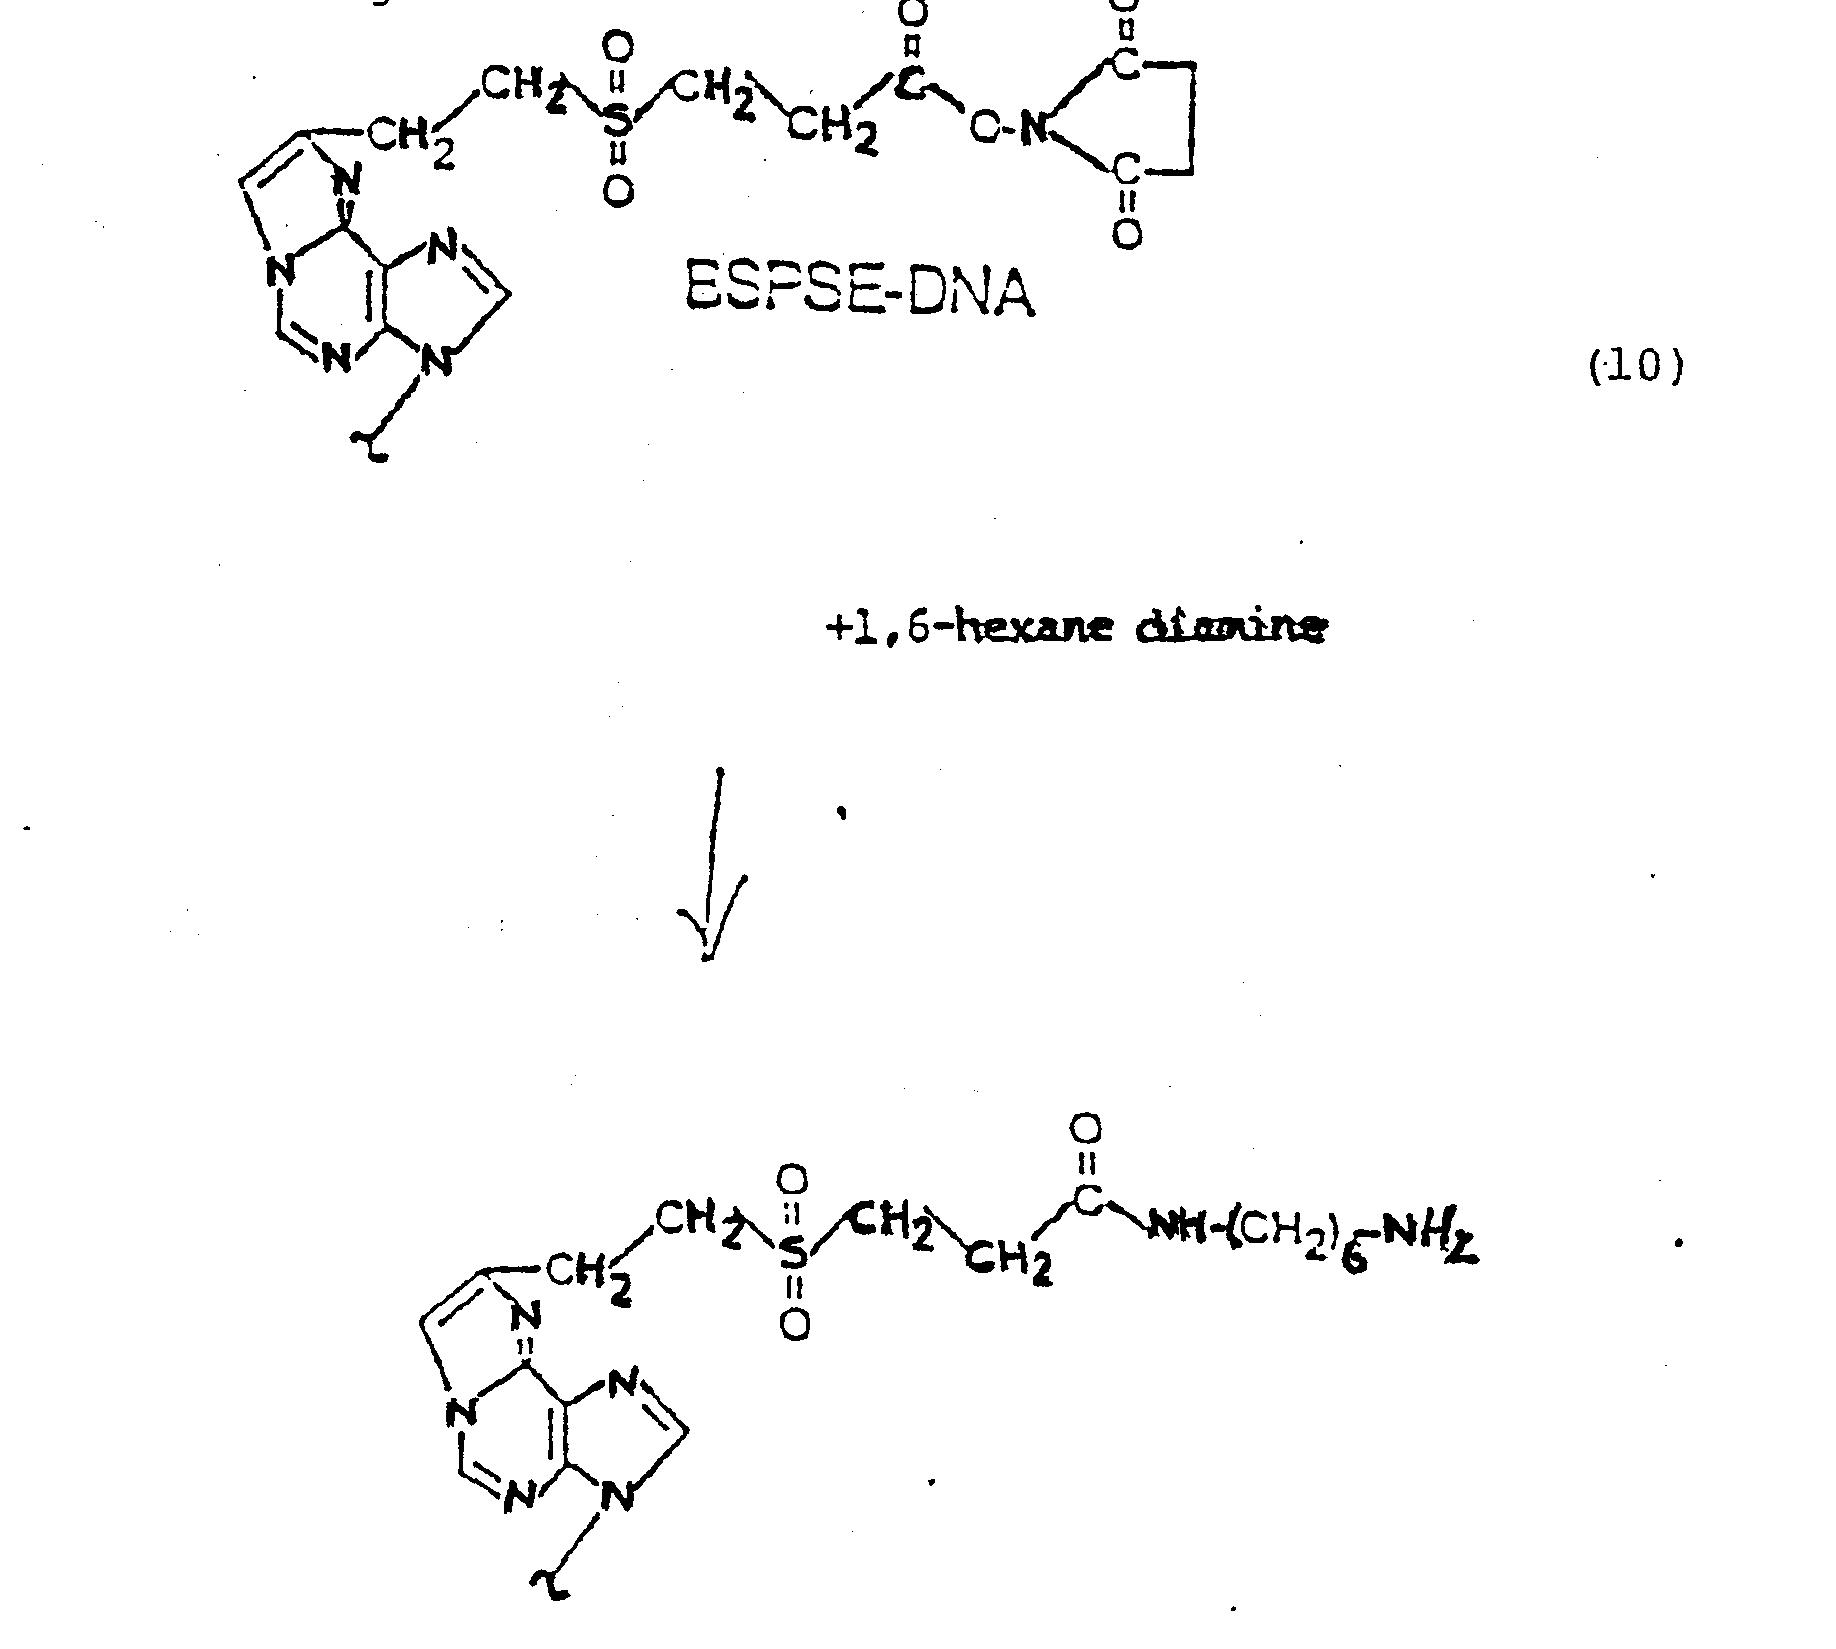 Nonisotopic Dna Probe Techniques Nt700v Ac Component Handlebar Top Bridge Parts Microfiche Schematic Array Ep0138357a2 Labeled Google Patents Rh Com